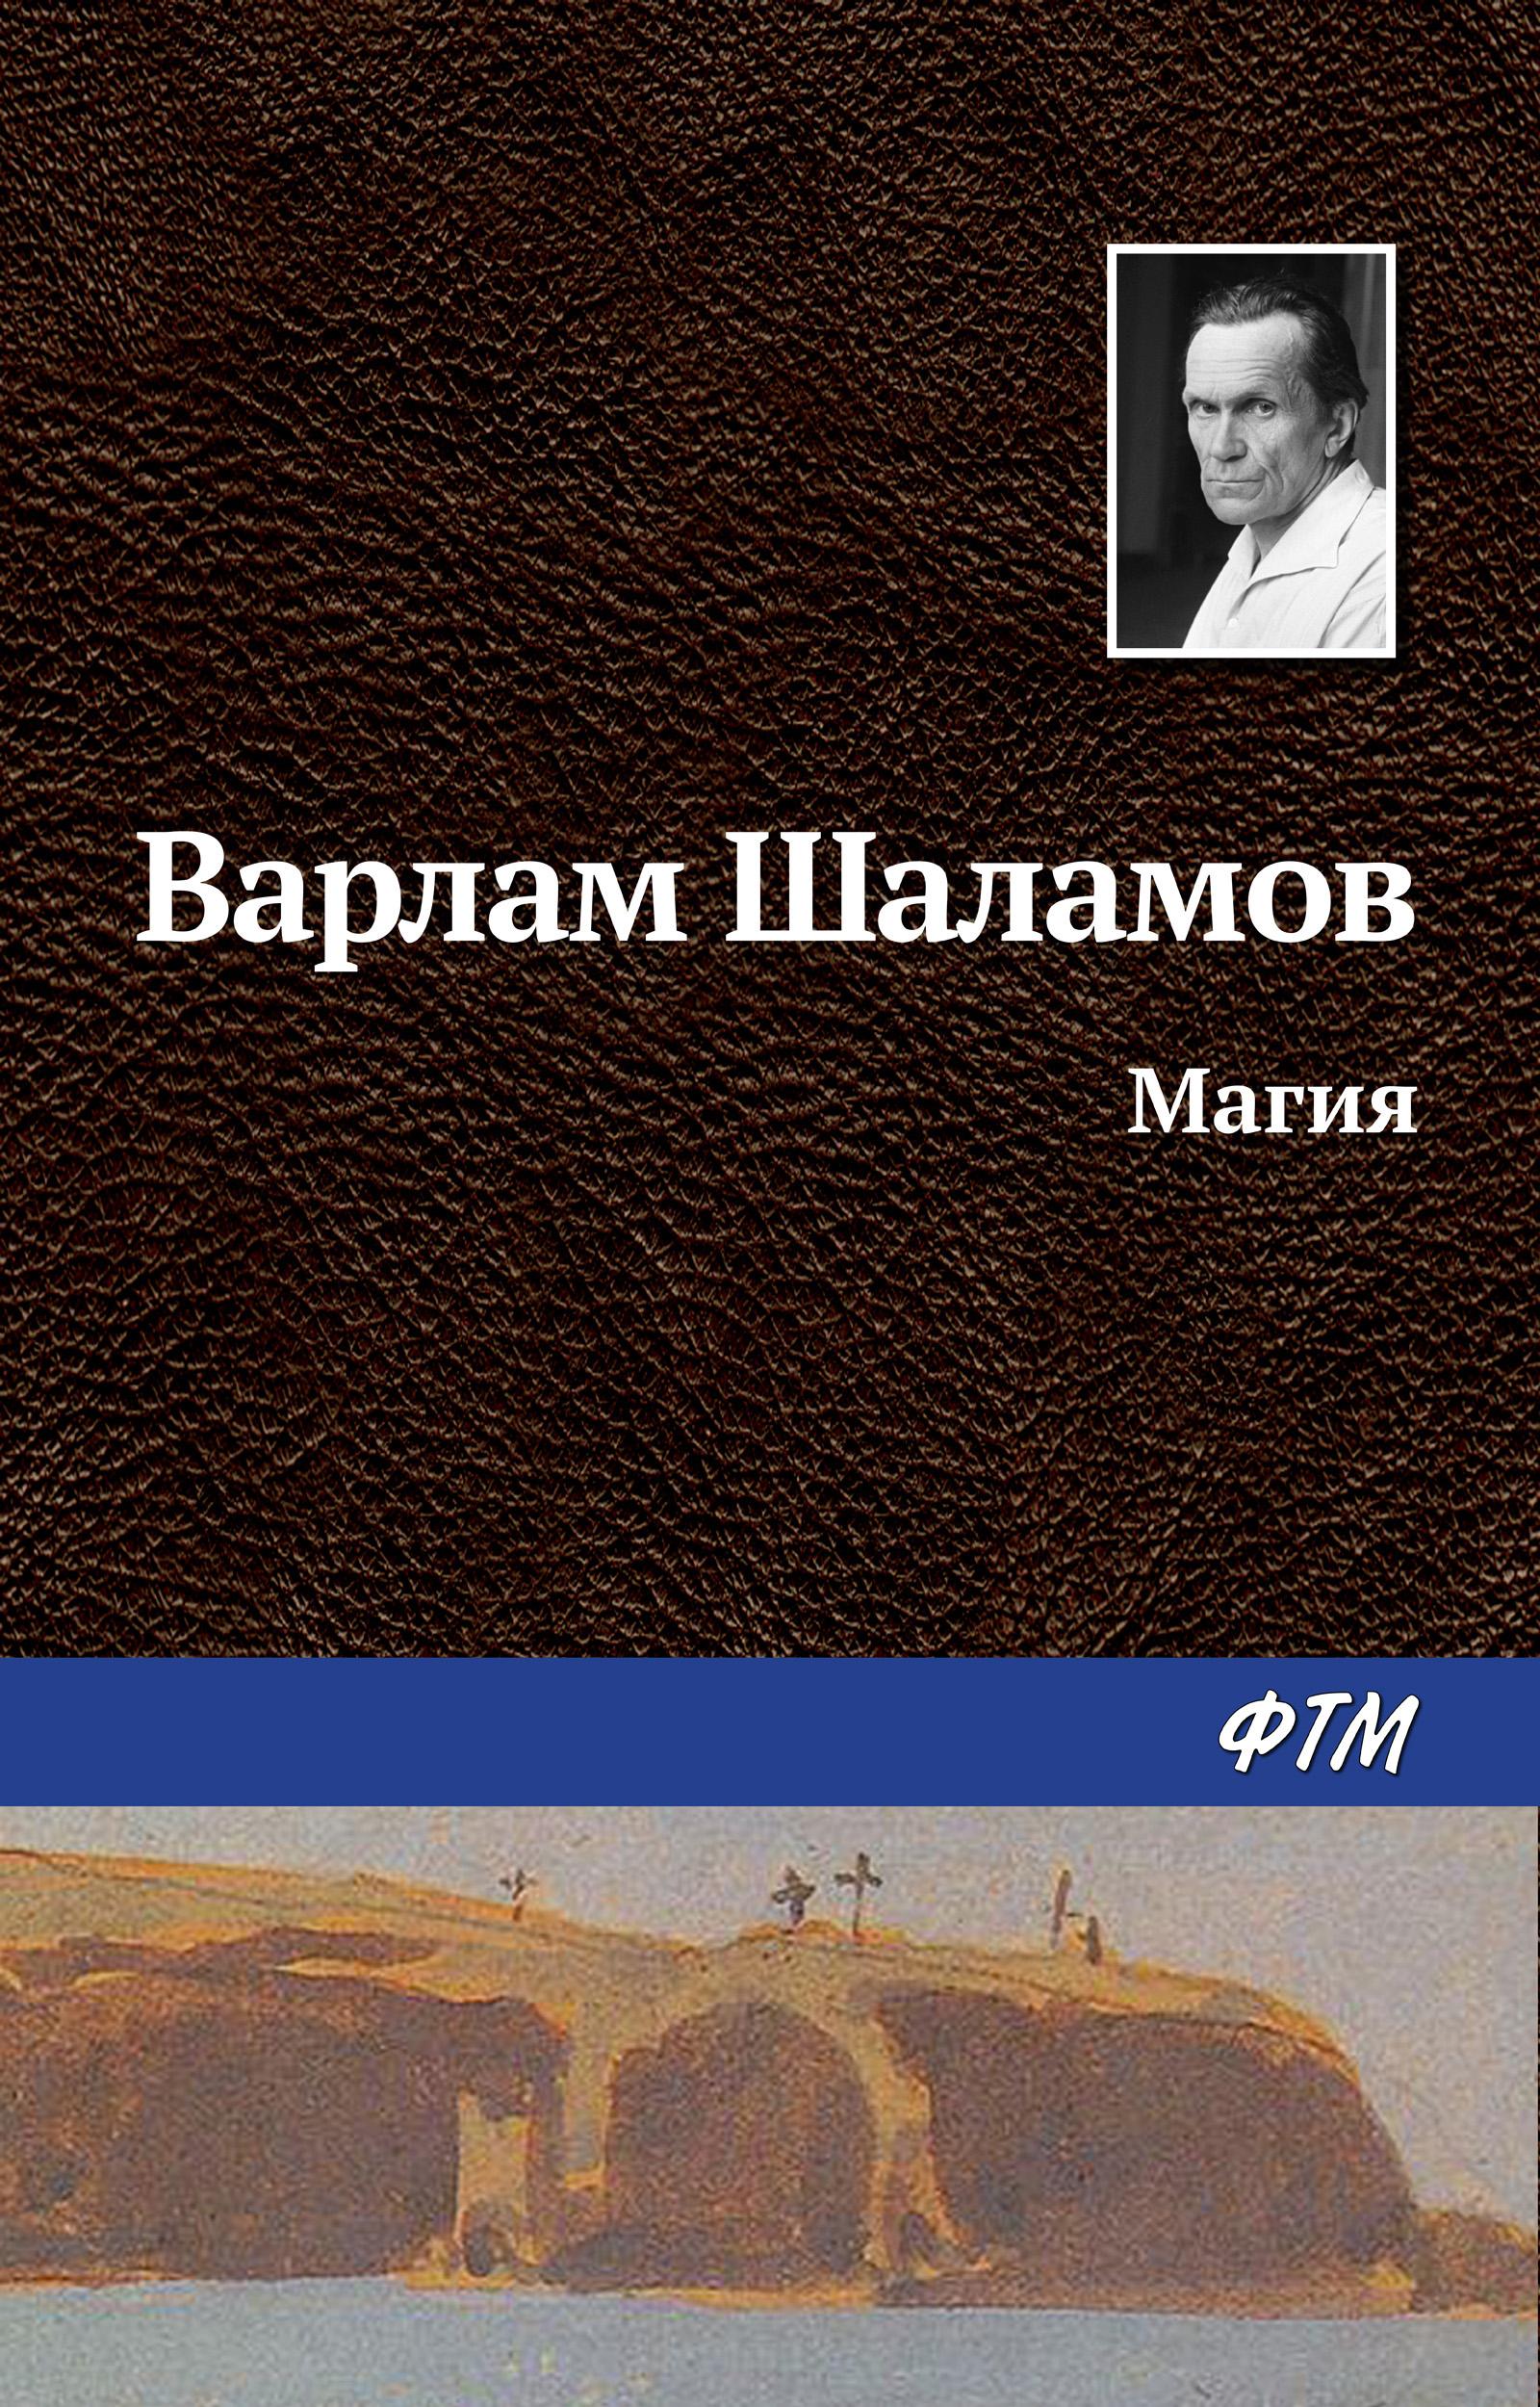 Варлам Шаламов Магия